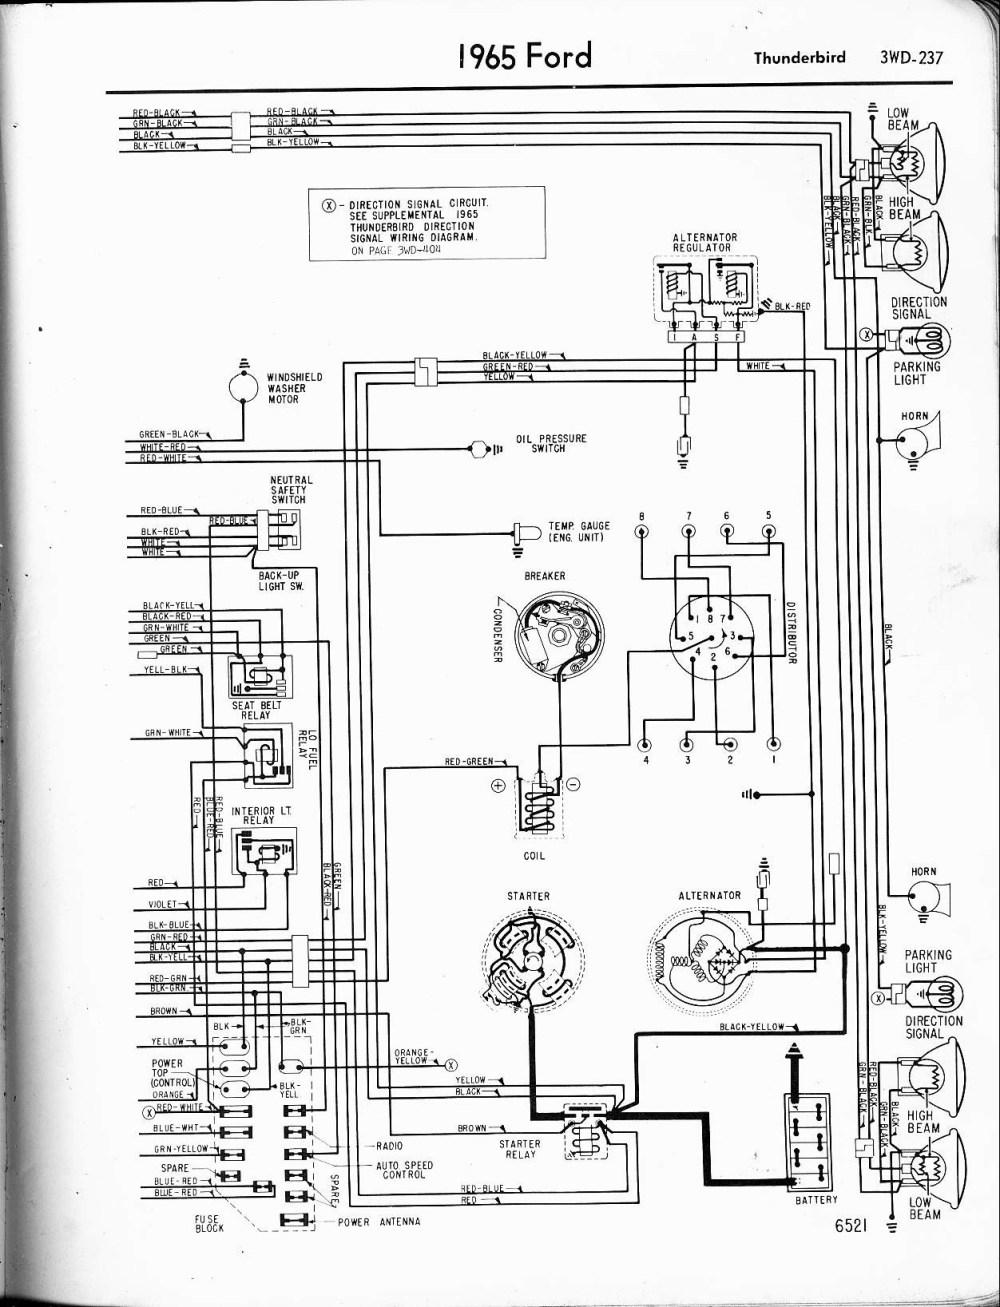 medium resolution of 1995 ford taurus engine diagram 1965 ford alternator wiring wiring diagram of 1995 ford taurus engine